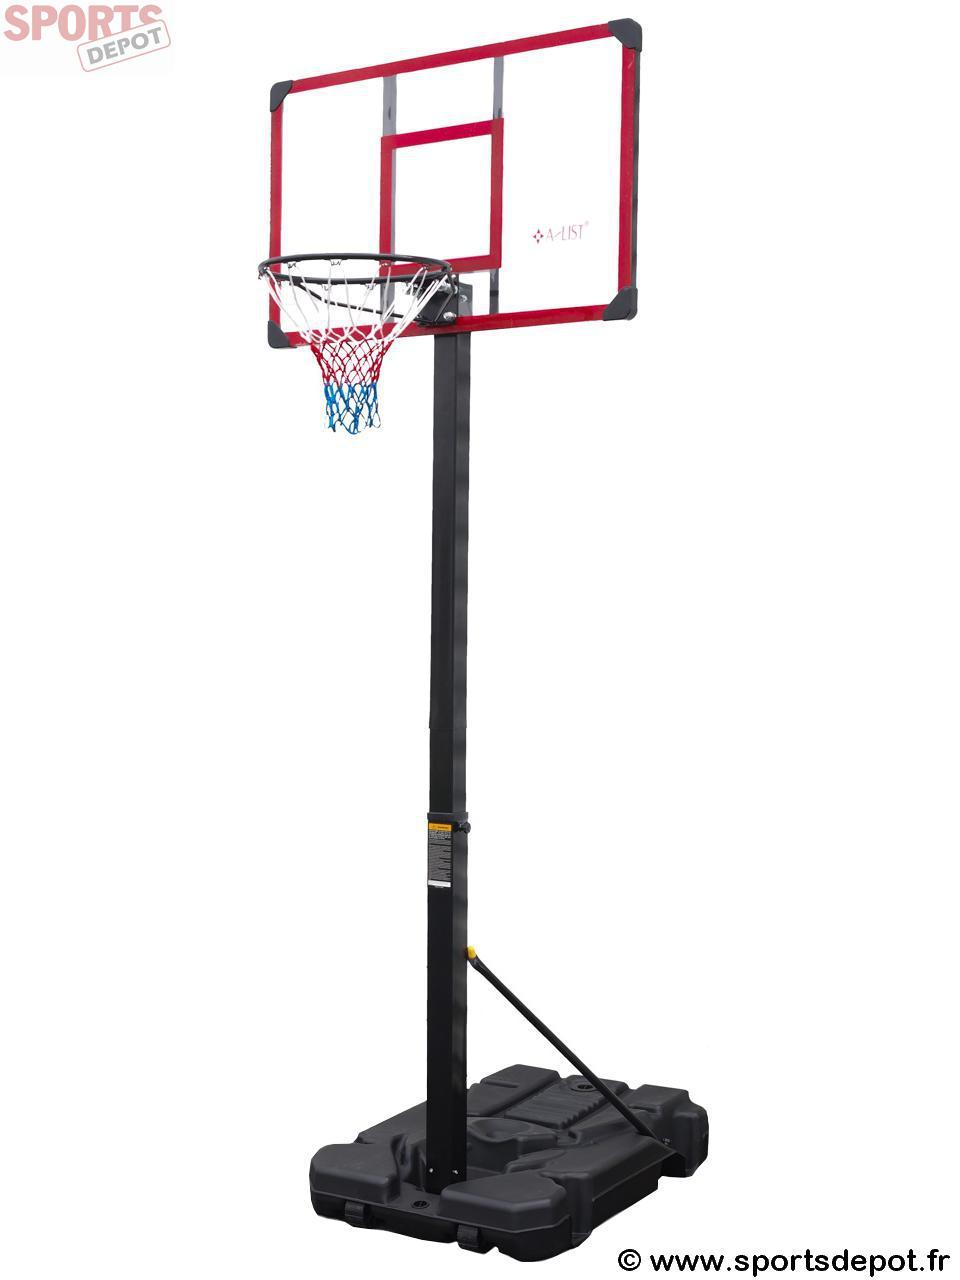 Acheter panneau de basket ball first price classic 112 70 225 305 homme m - Panneau de basket exterieur ...